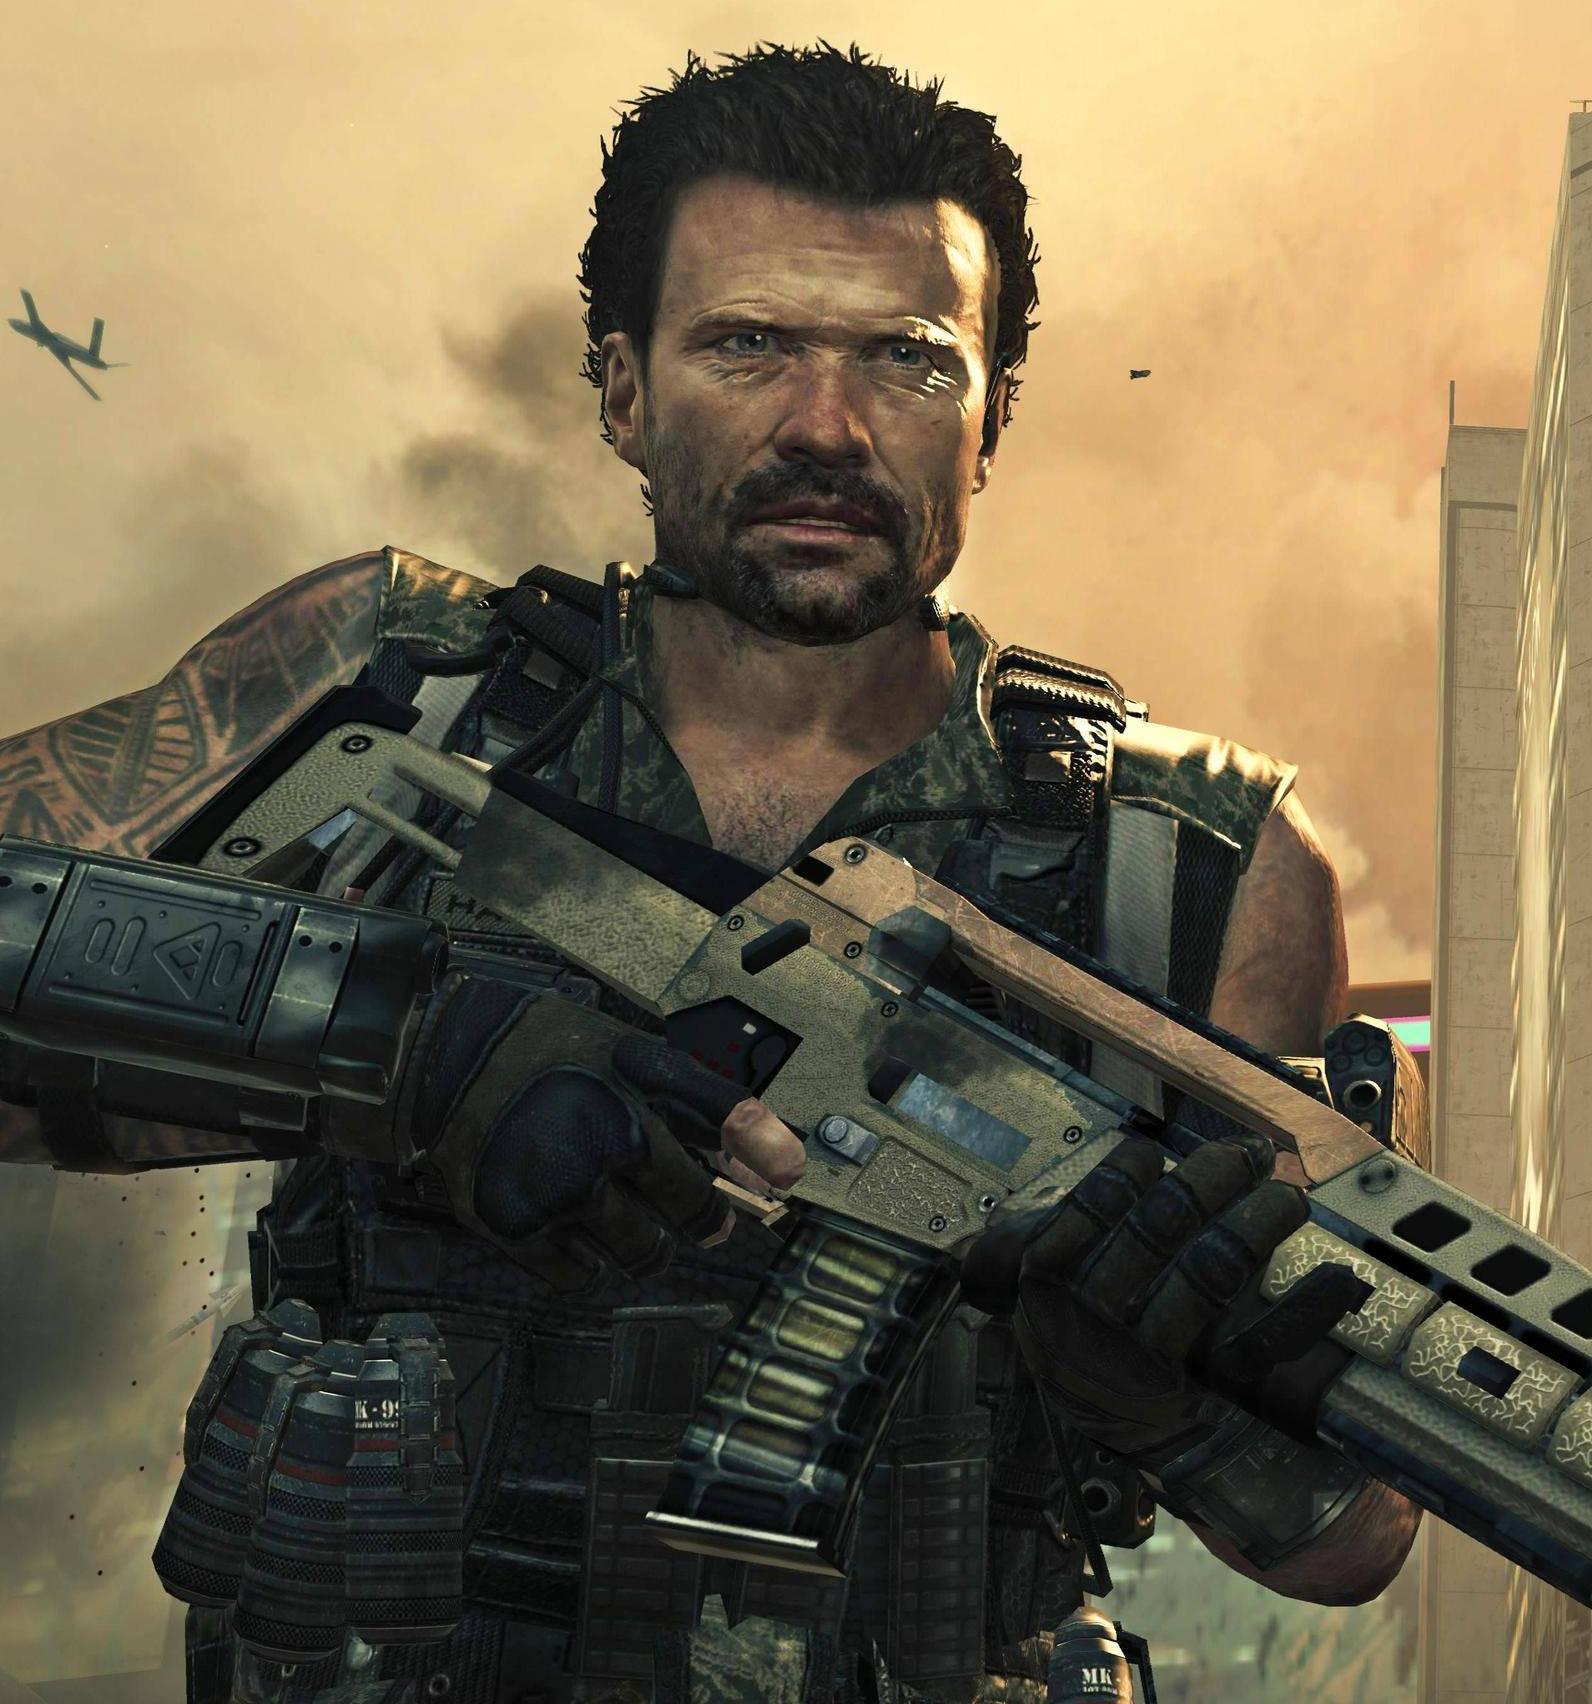 Call Of Duty Black Ops 2 Harper Wiring Diagrams Mike Wiki Fandom Powered By Wikia Rh Callofduty Com Or Menendez